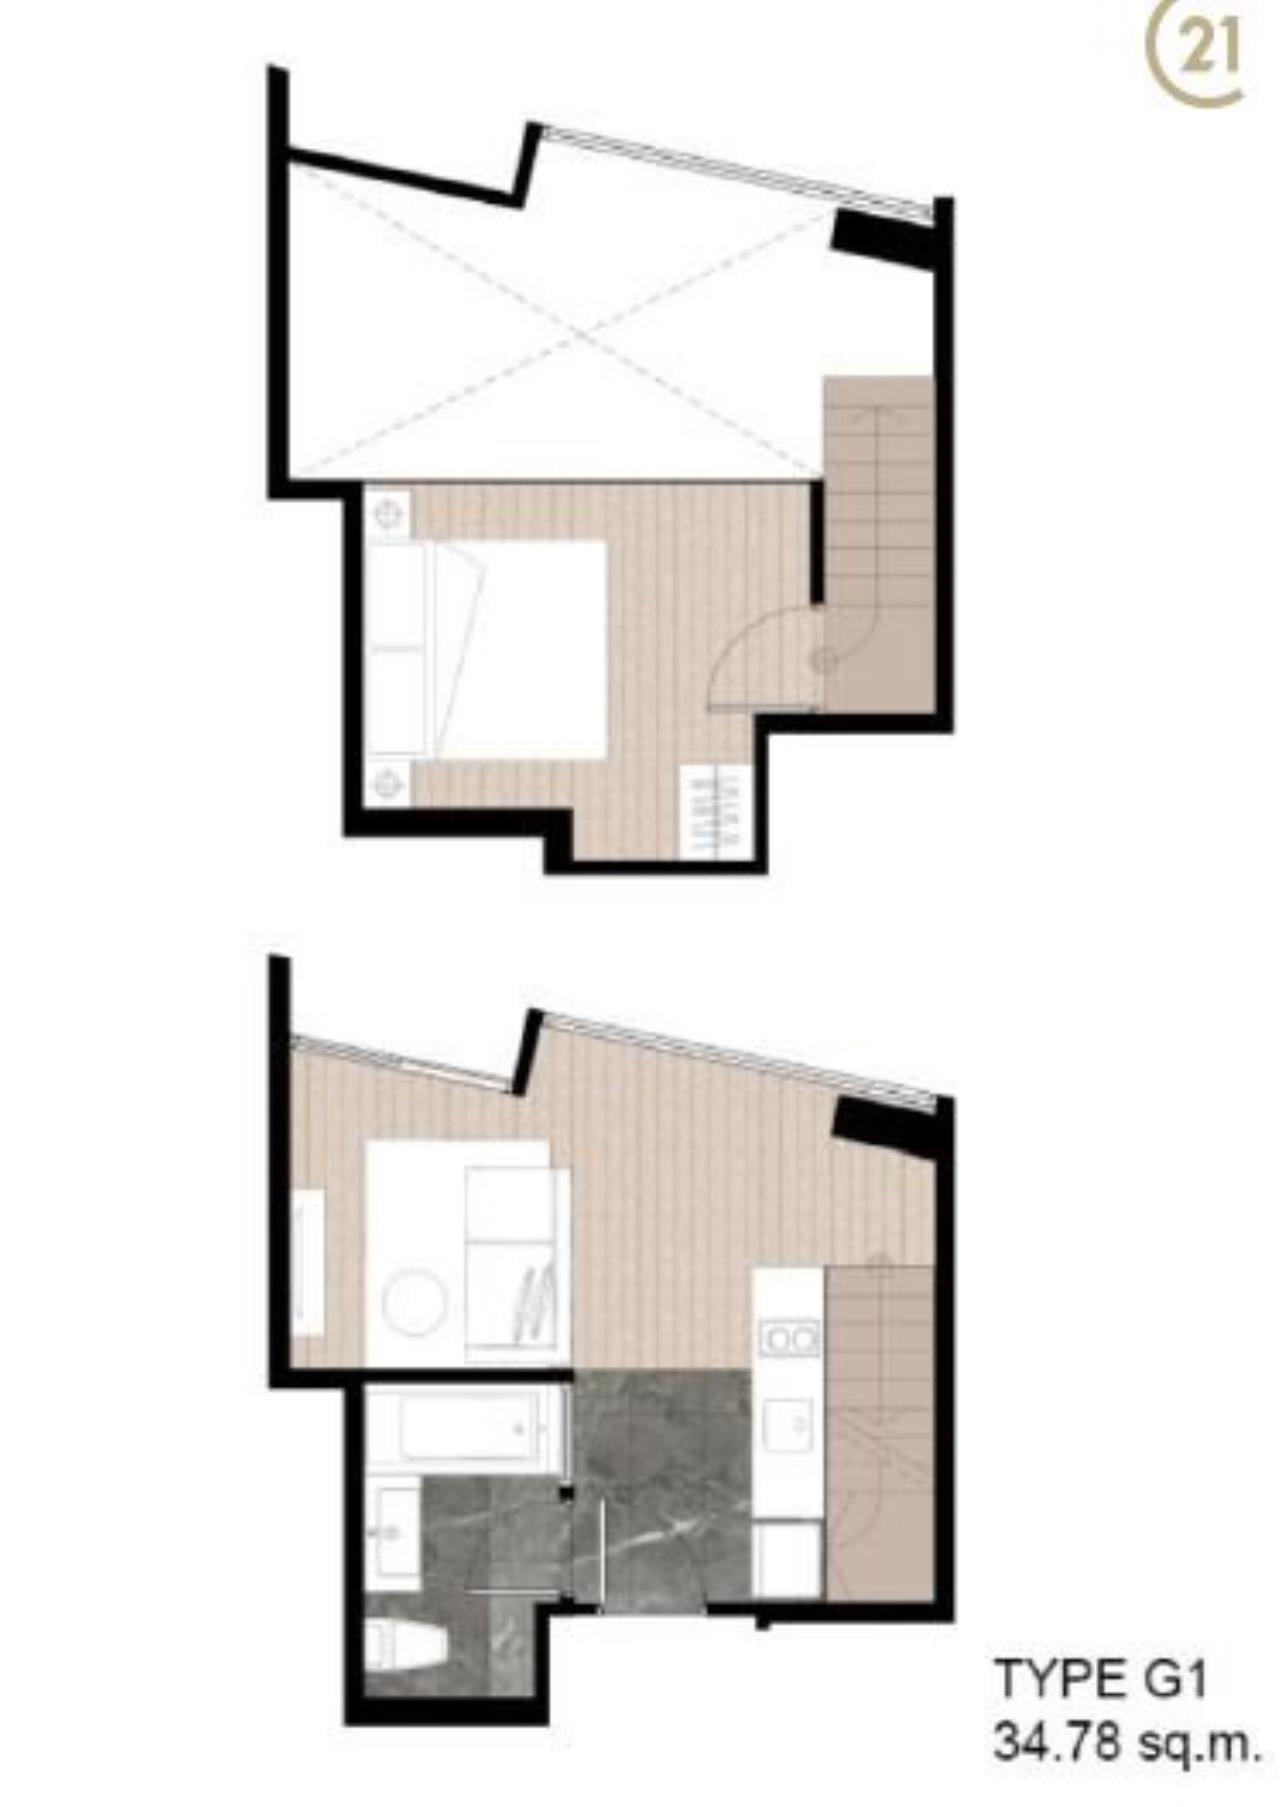 Century21 Skylux Agency's Walden Sukhumvit 39 / Condo For Sale / 1 Bedroom / 34.78 SQM / BTS Phrom Phong / Bangkok 1